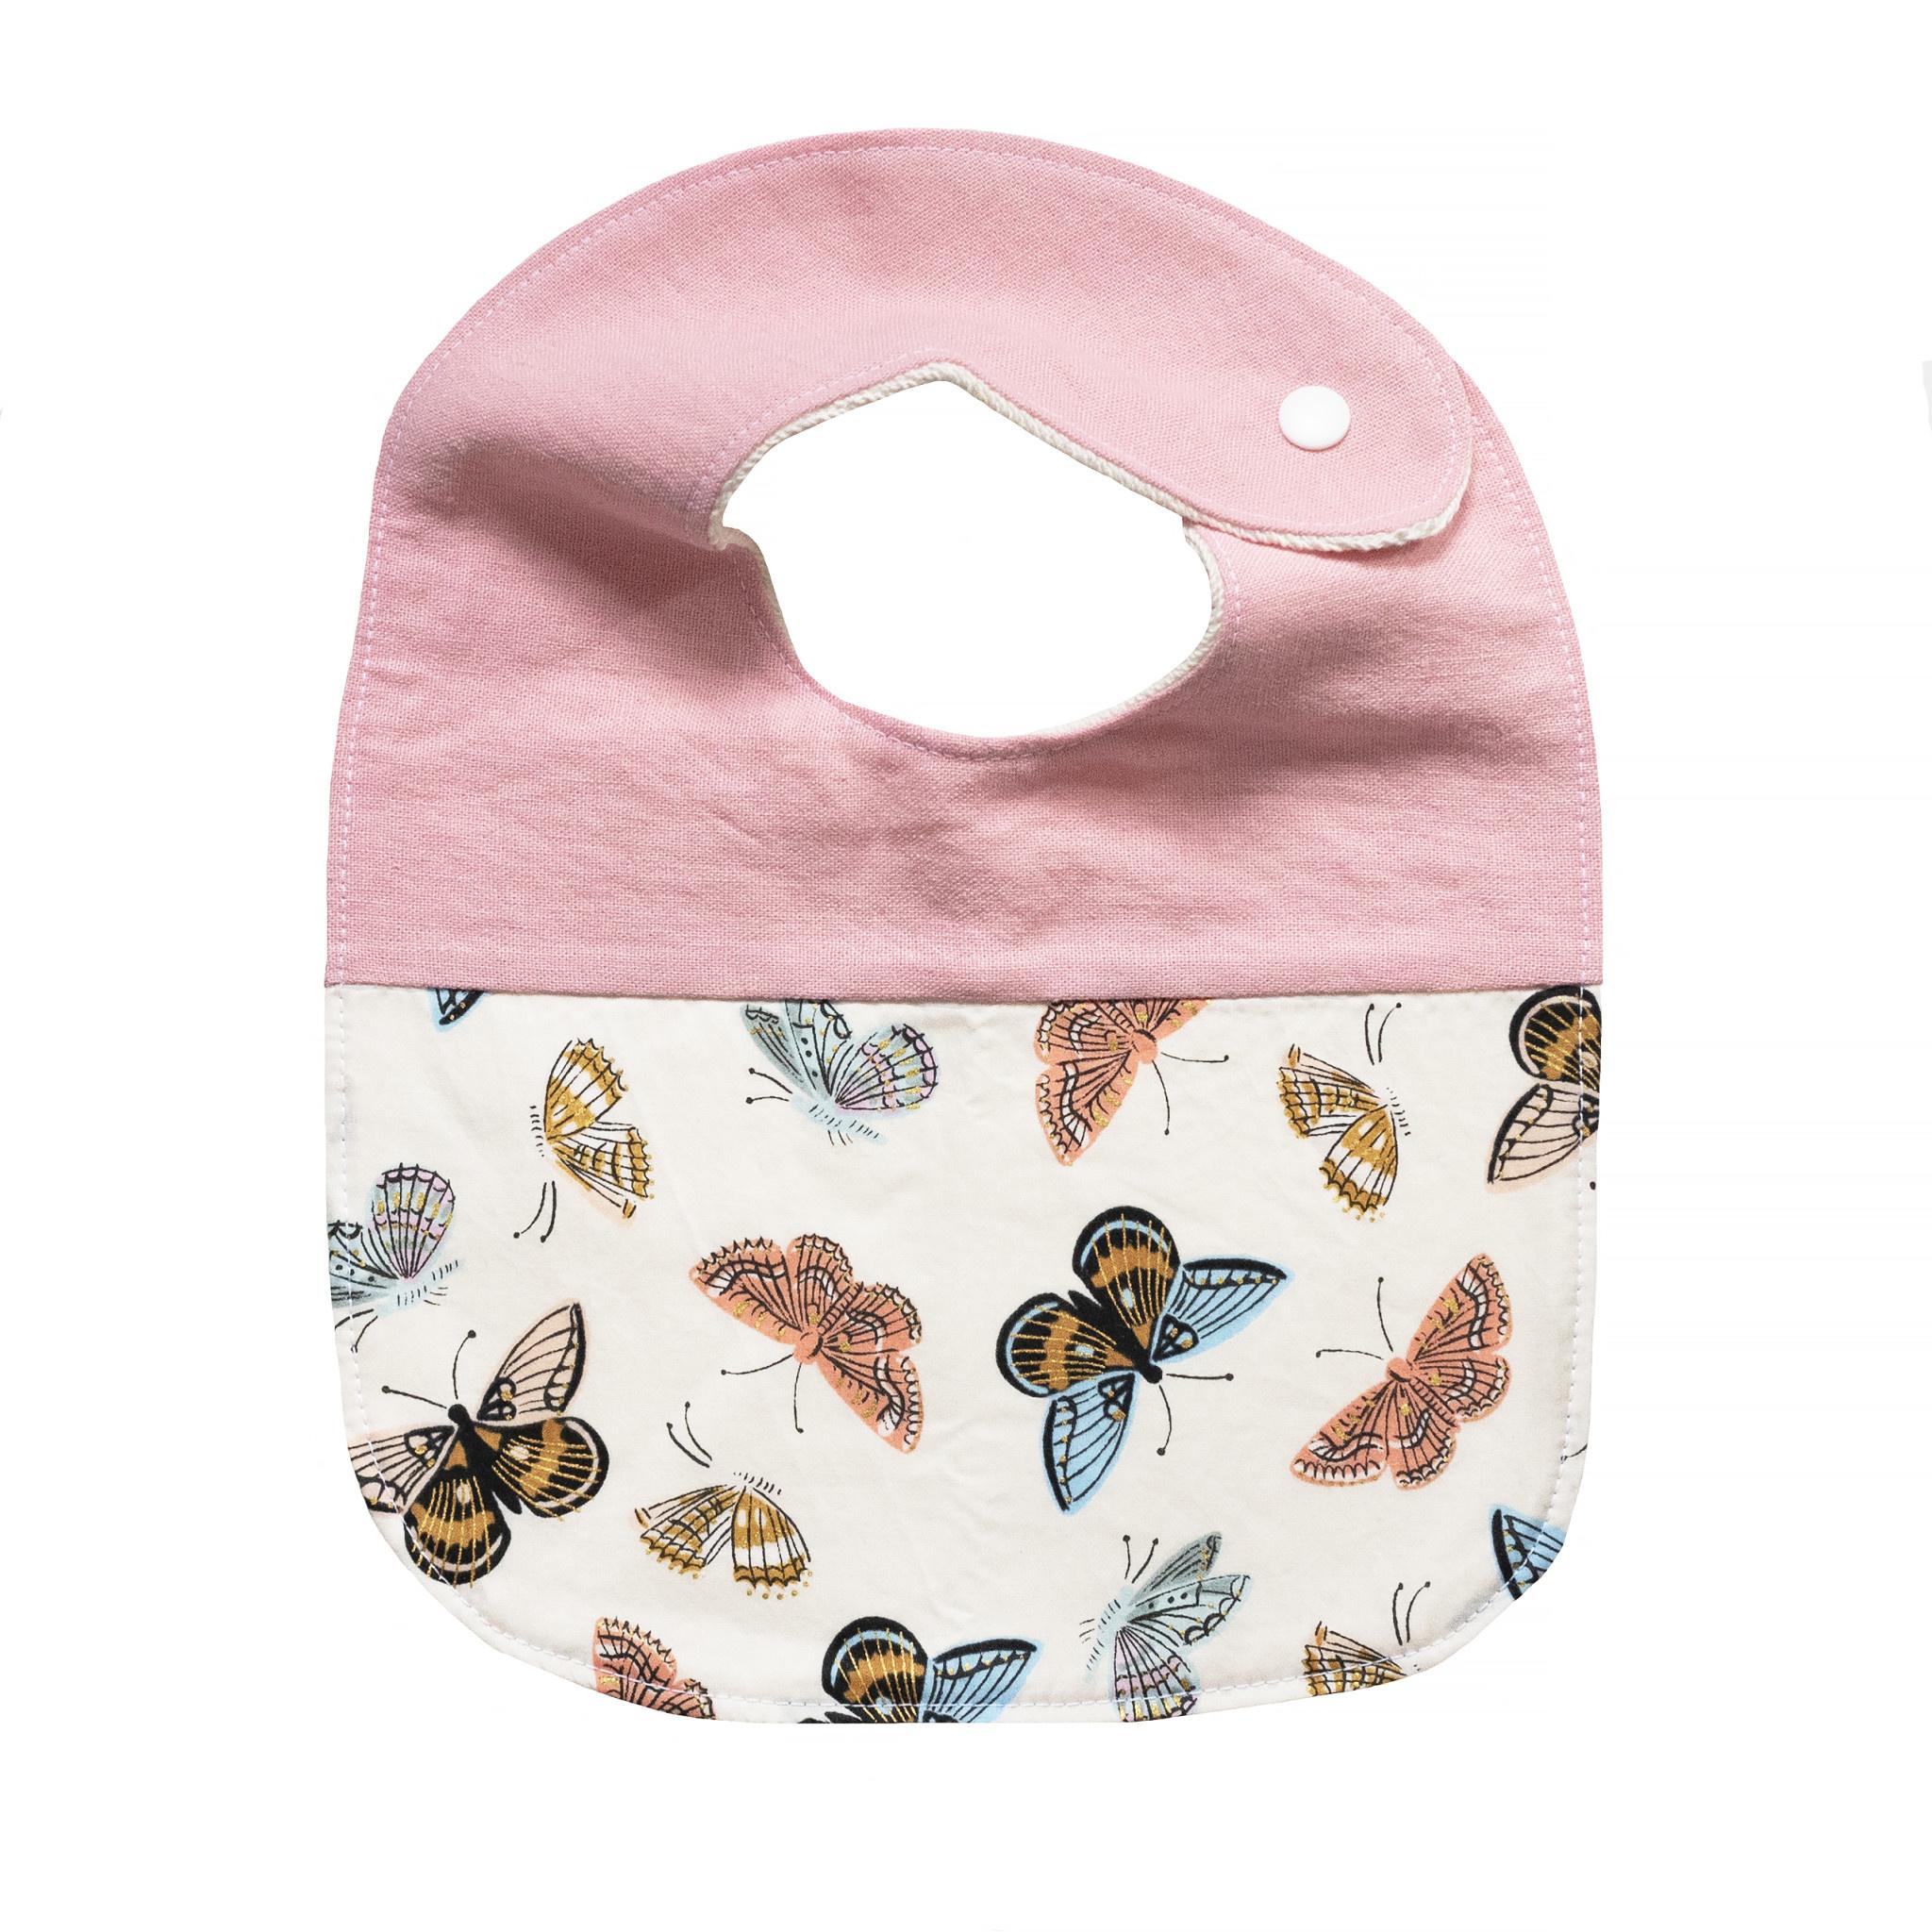 Two Little Beans Baby Bib - Rifle Butterflies